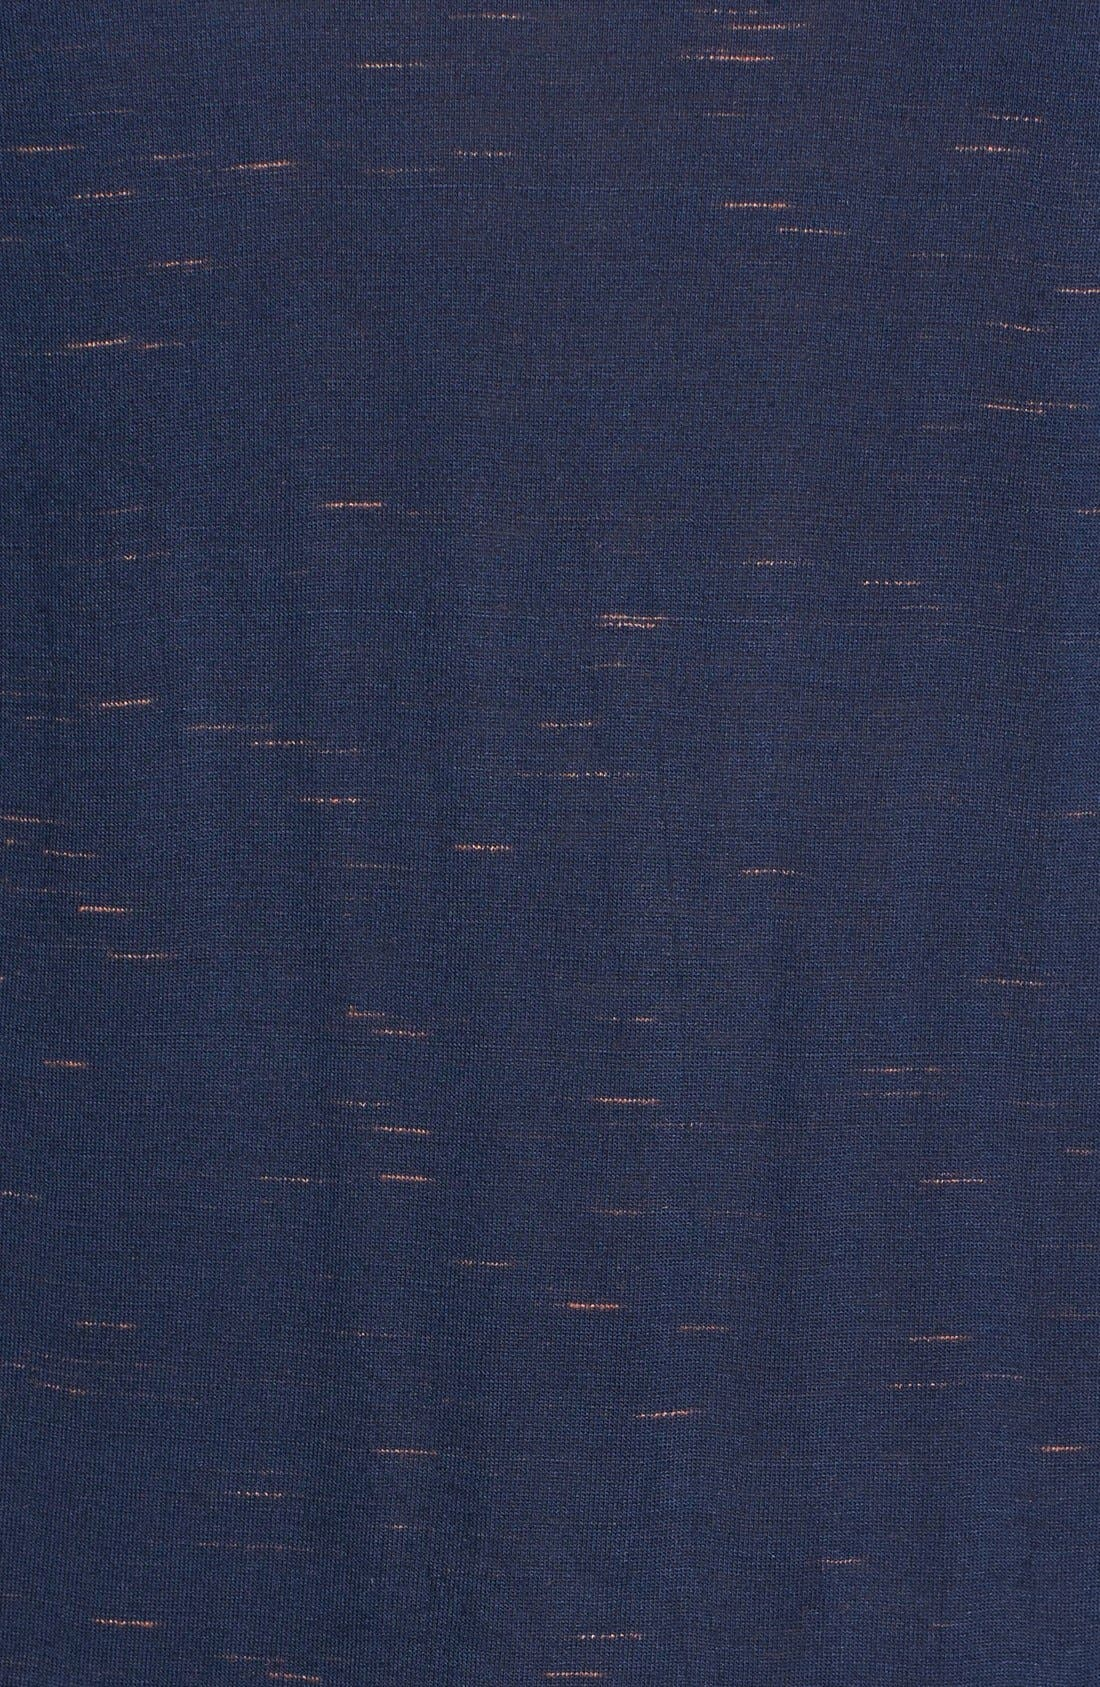 'Tracer' Mélange Knit Tee,                             Alternate thumbnail 3, color,                             410